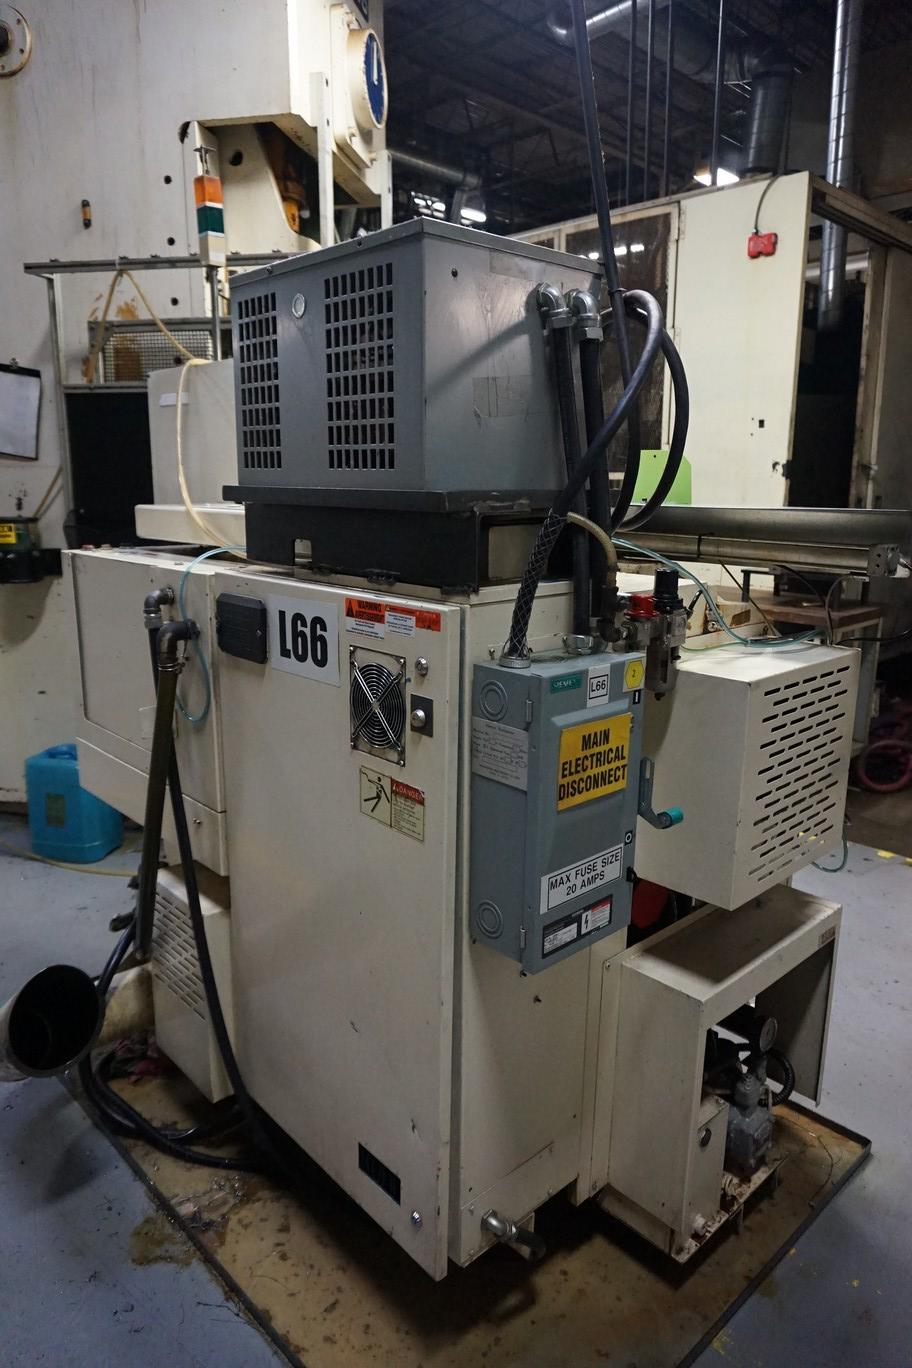 Takamatsu Model MT CNC Lathe 200/220V c/w Transformer (L66) - Image 6 of 7